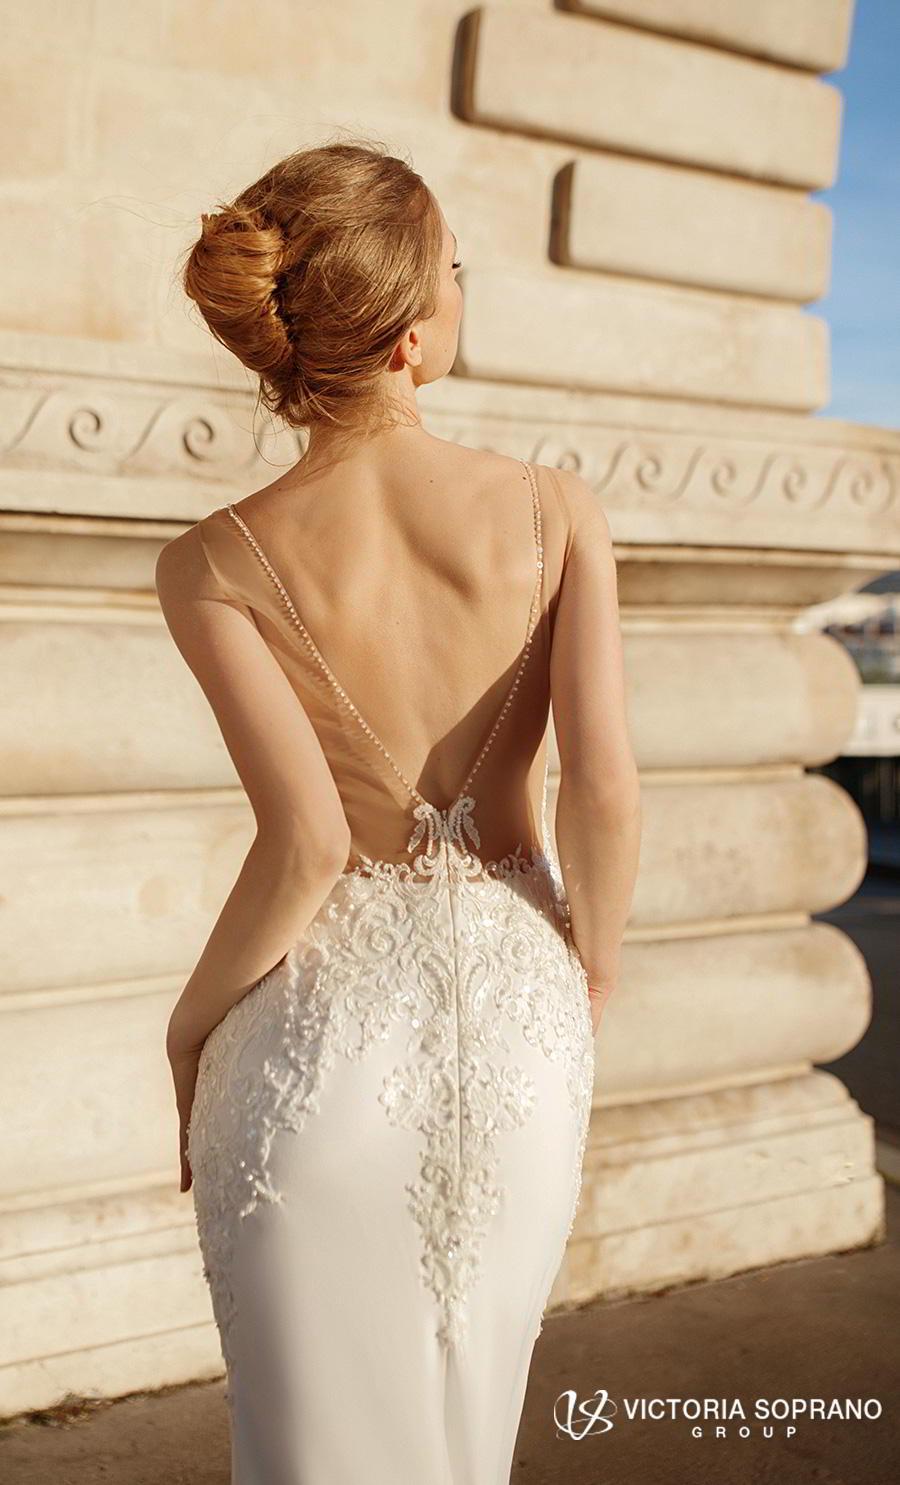 victoria soprano 2019 bridal sleeveless deep plunging v neck heavily embellished bodice elegant sheath wedding dress open v back short train (gustin) zbv